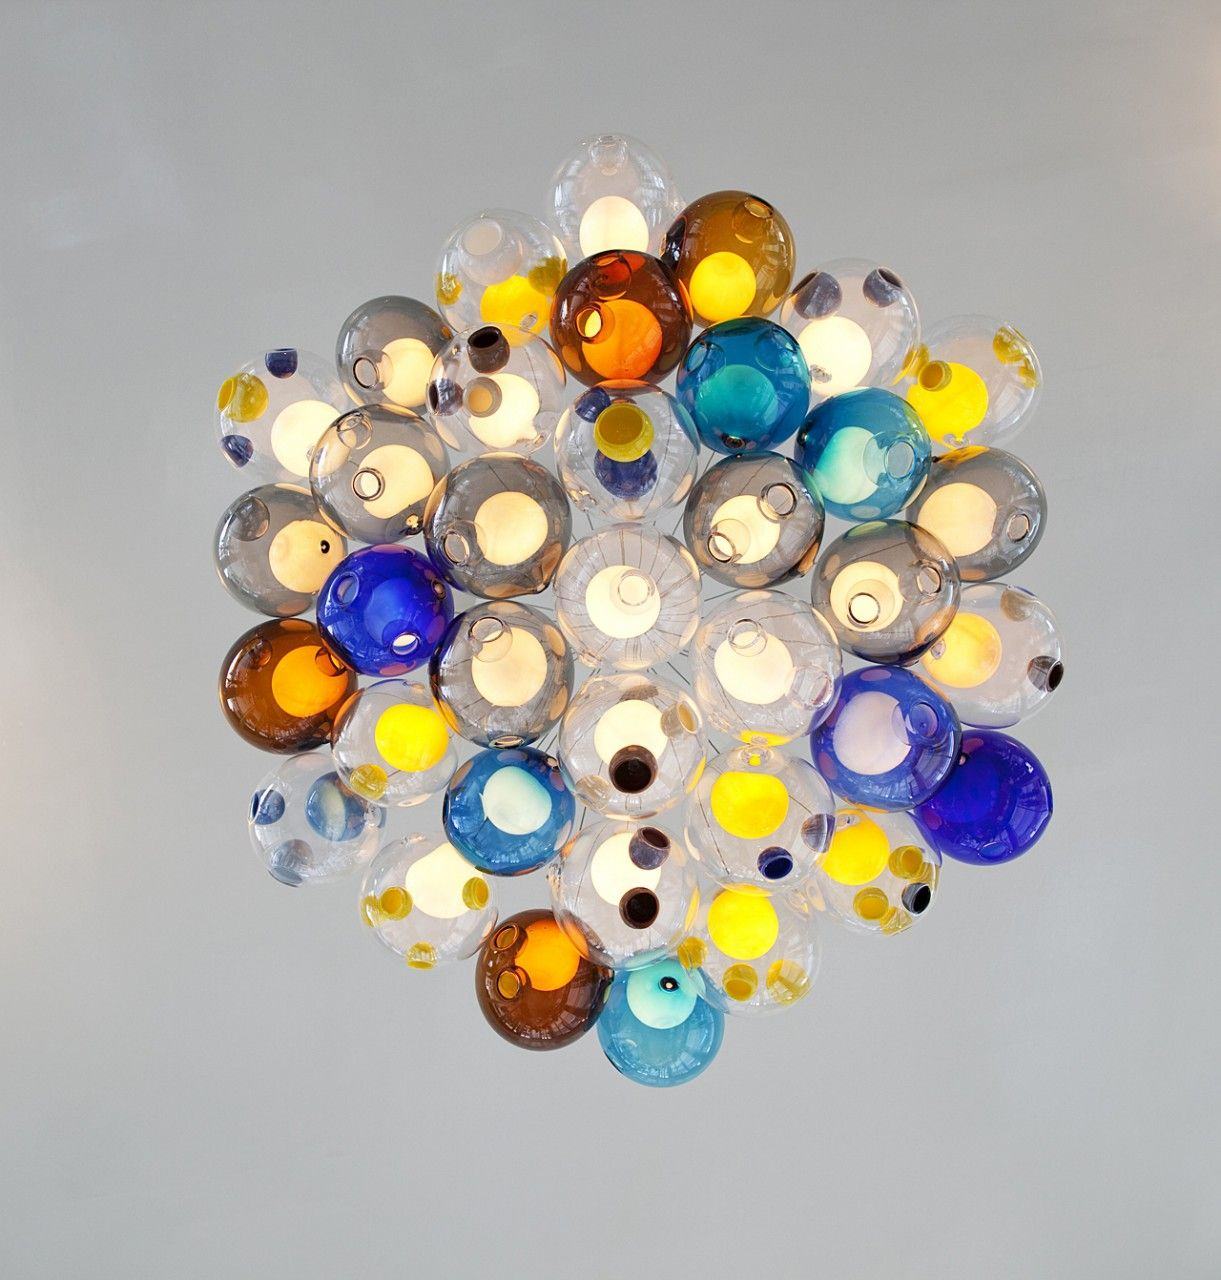 Raum mit lichtern pendant light by canadian designers bocci  connect cobalt and